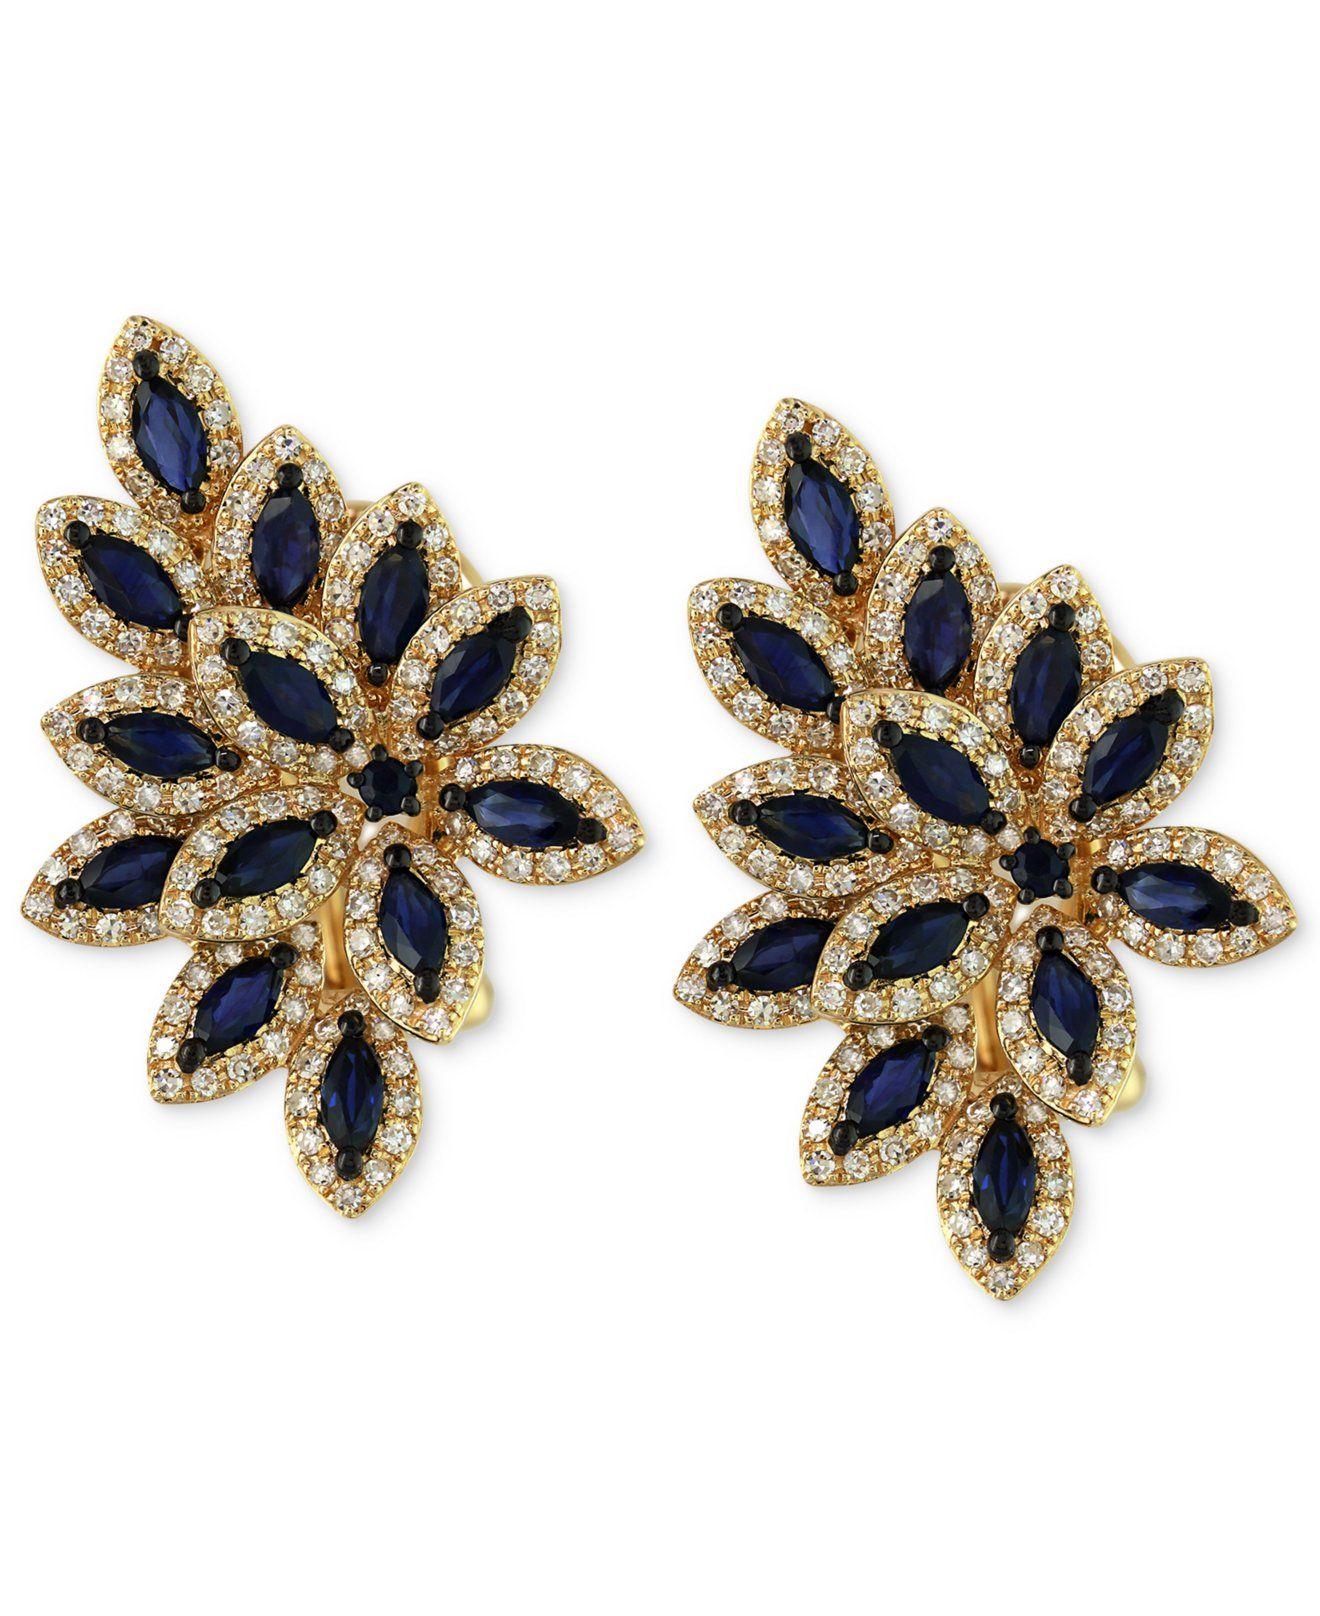 4e1a839f8 Velvet Bleu by EFFY Sapphire (2-1/2 ct. t.w.) and Diamond (1 ct. t.w.)  Earrings in 14k Gold - Earrings - Jewelry & Watches - Macy's